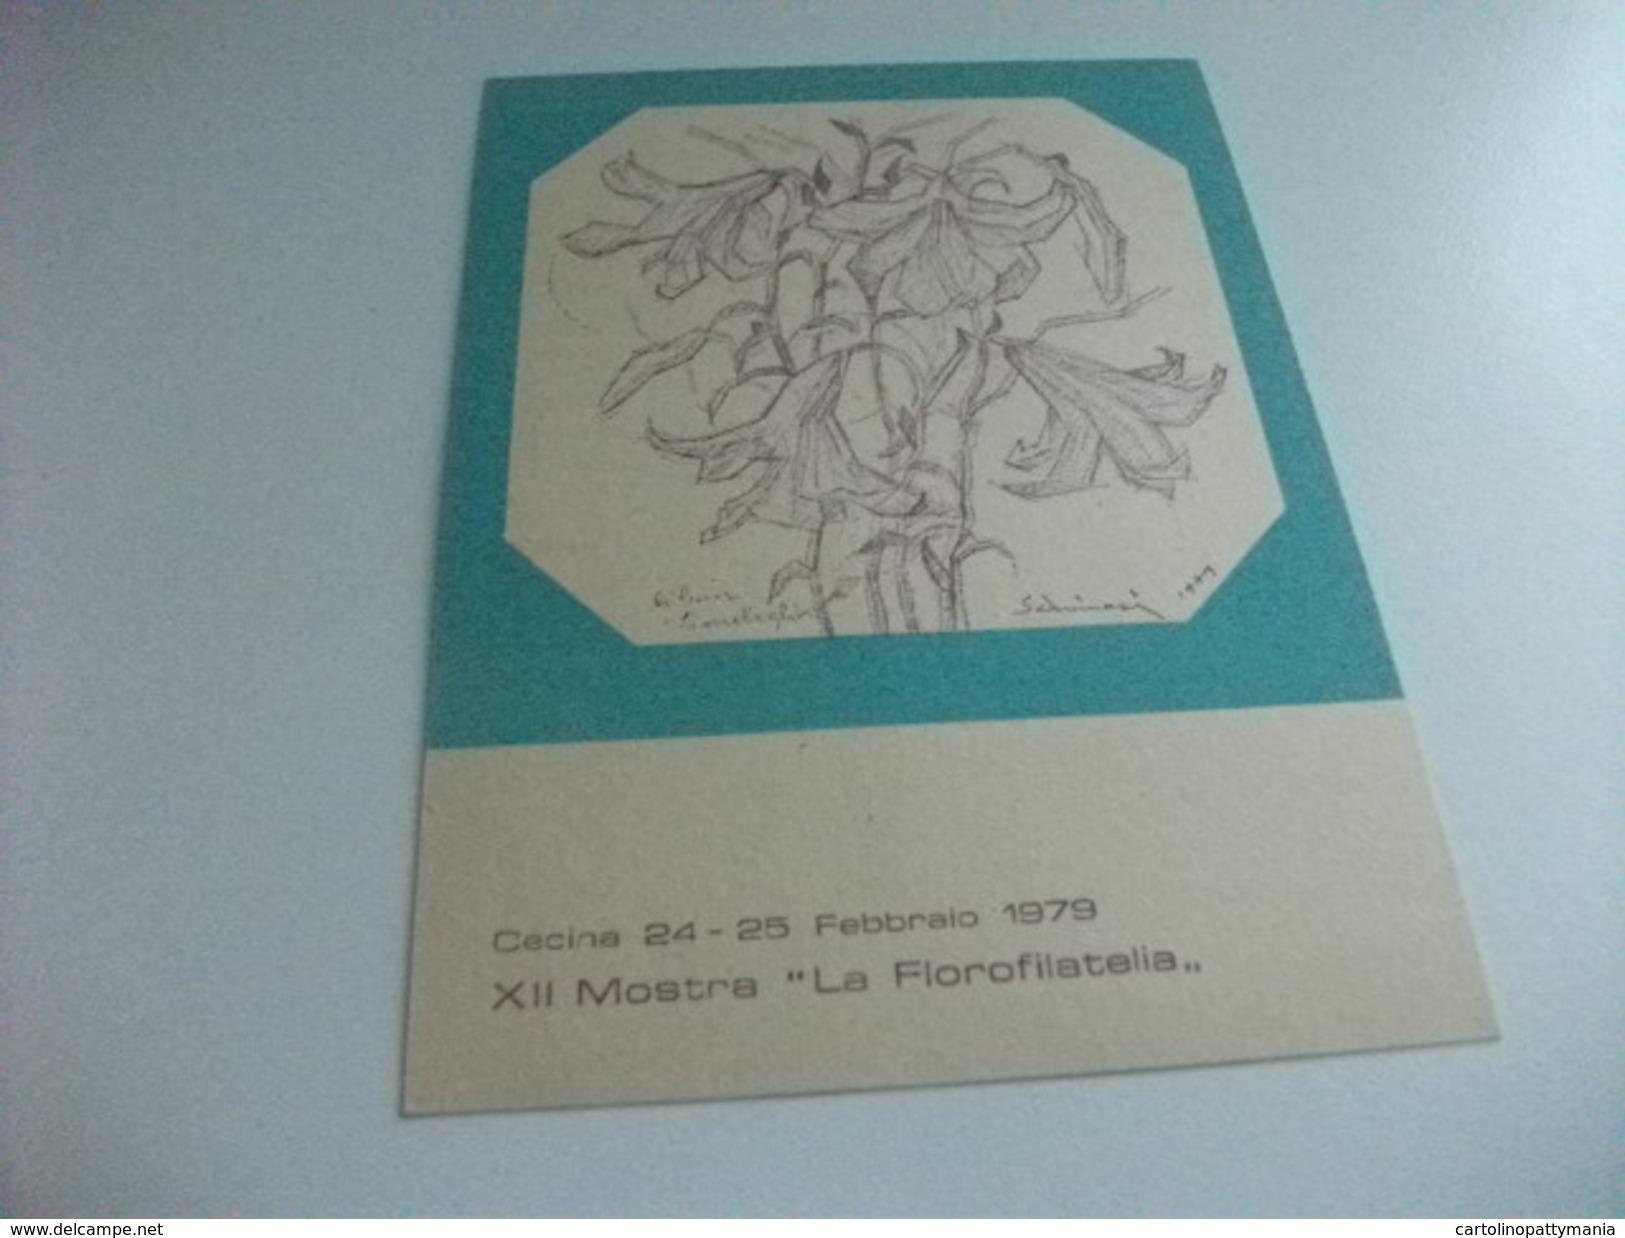 STORIA POSTALE Cartolina Postale Cecina XII MOSTRA LA FLOROFILATELIA FIORI ILLUSTRATORE VEDI FIRMA DANIEL SCHINASI 1979 - Manifestazioni